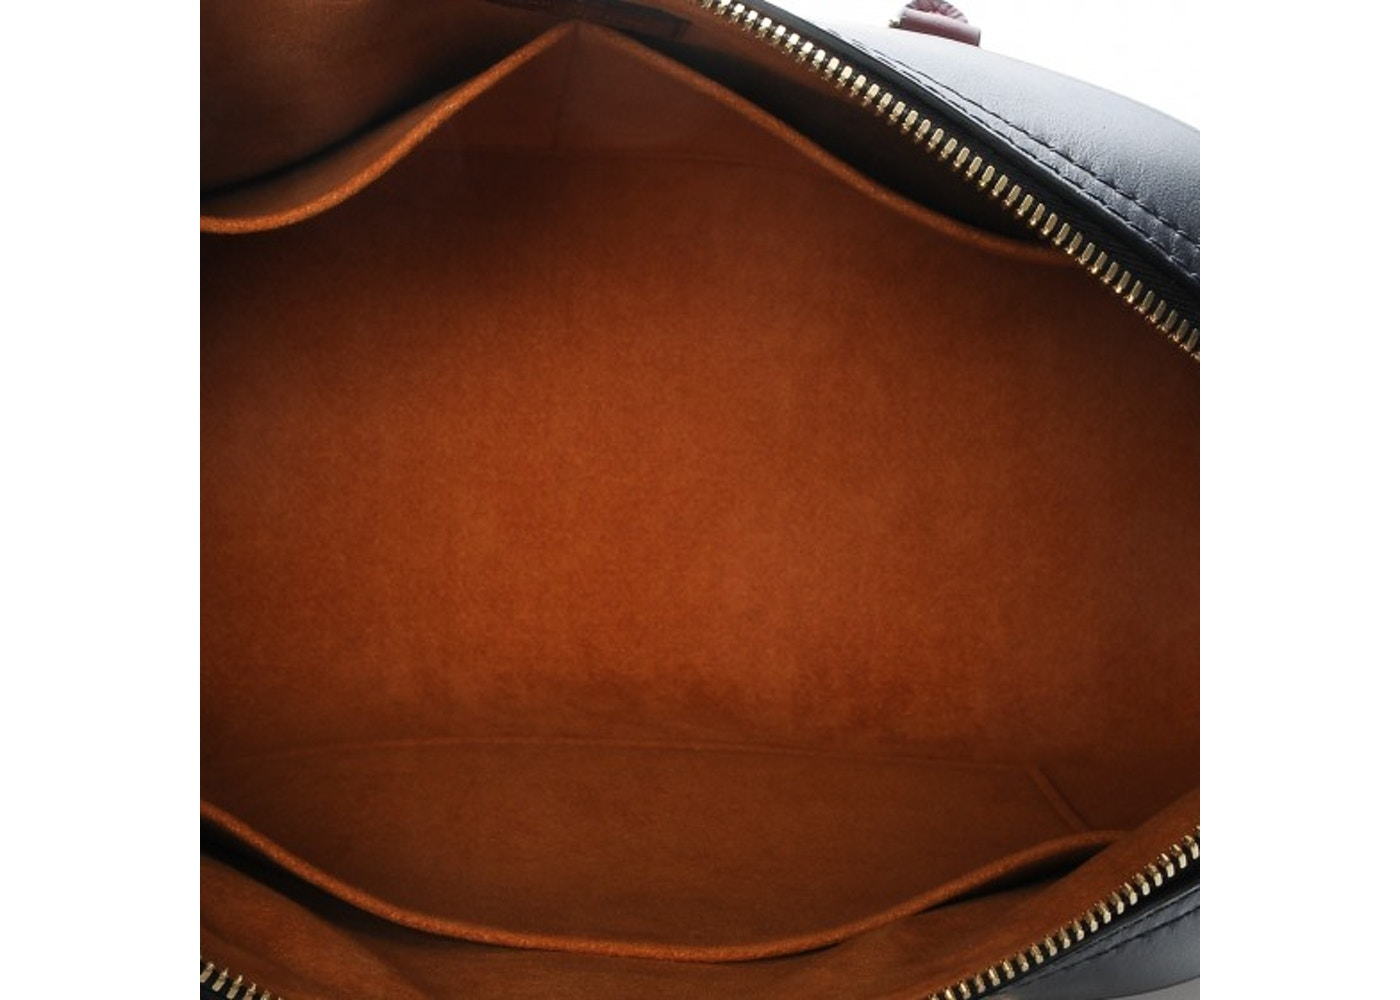 baa13be5d55b Louis Vuitton Shoulder Bag Tuileries Marine Bordeaux Monogram  Brown Burgundy Navy Blue